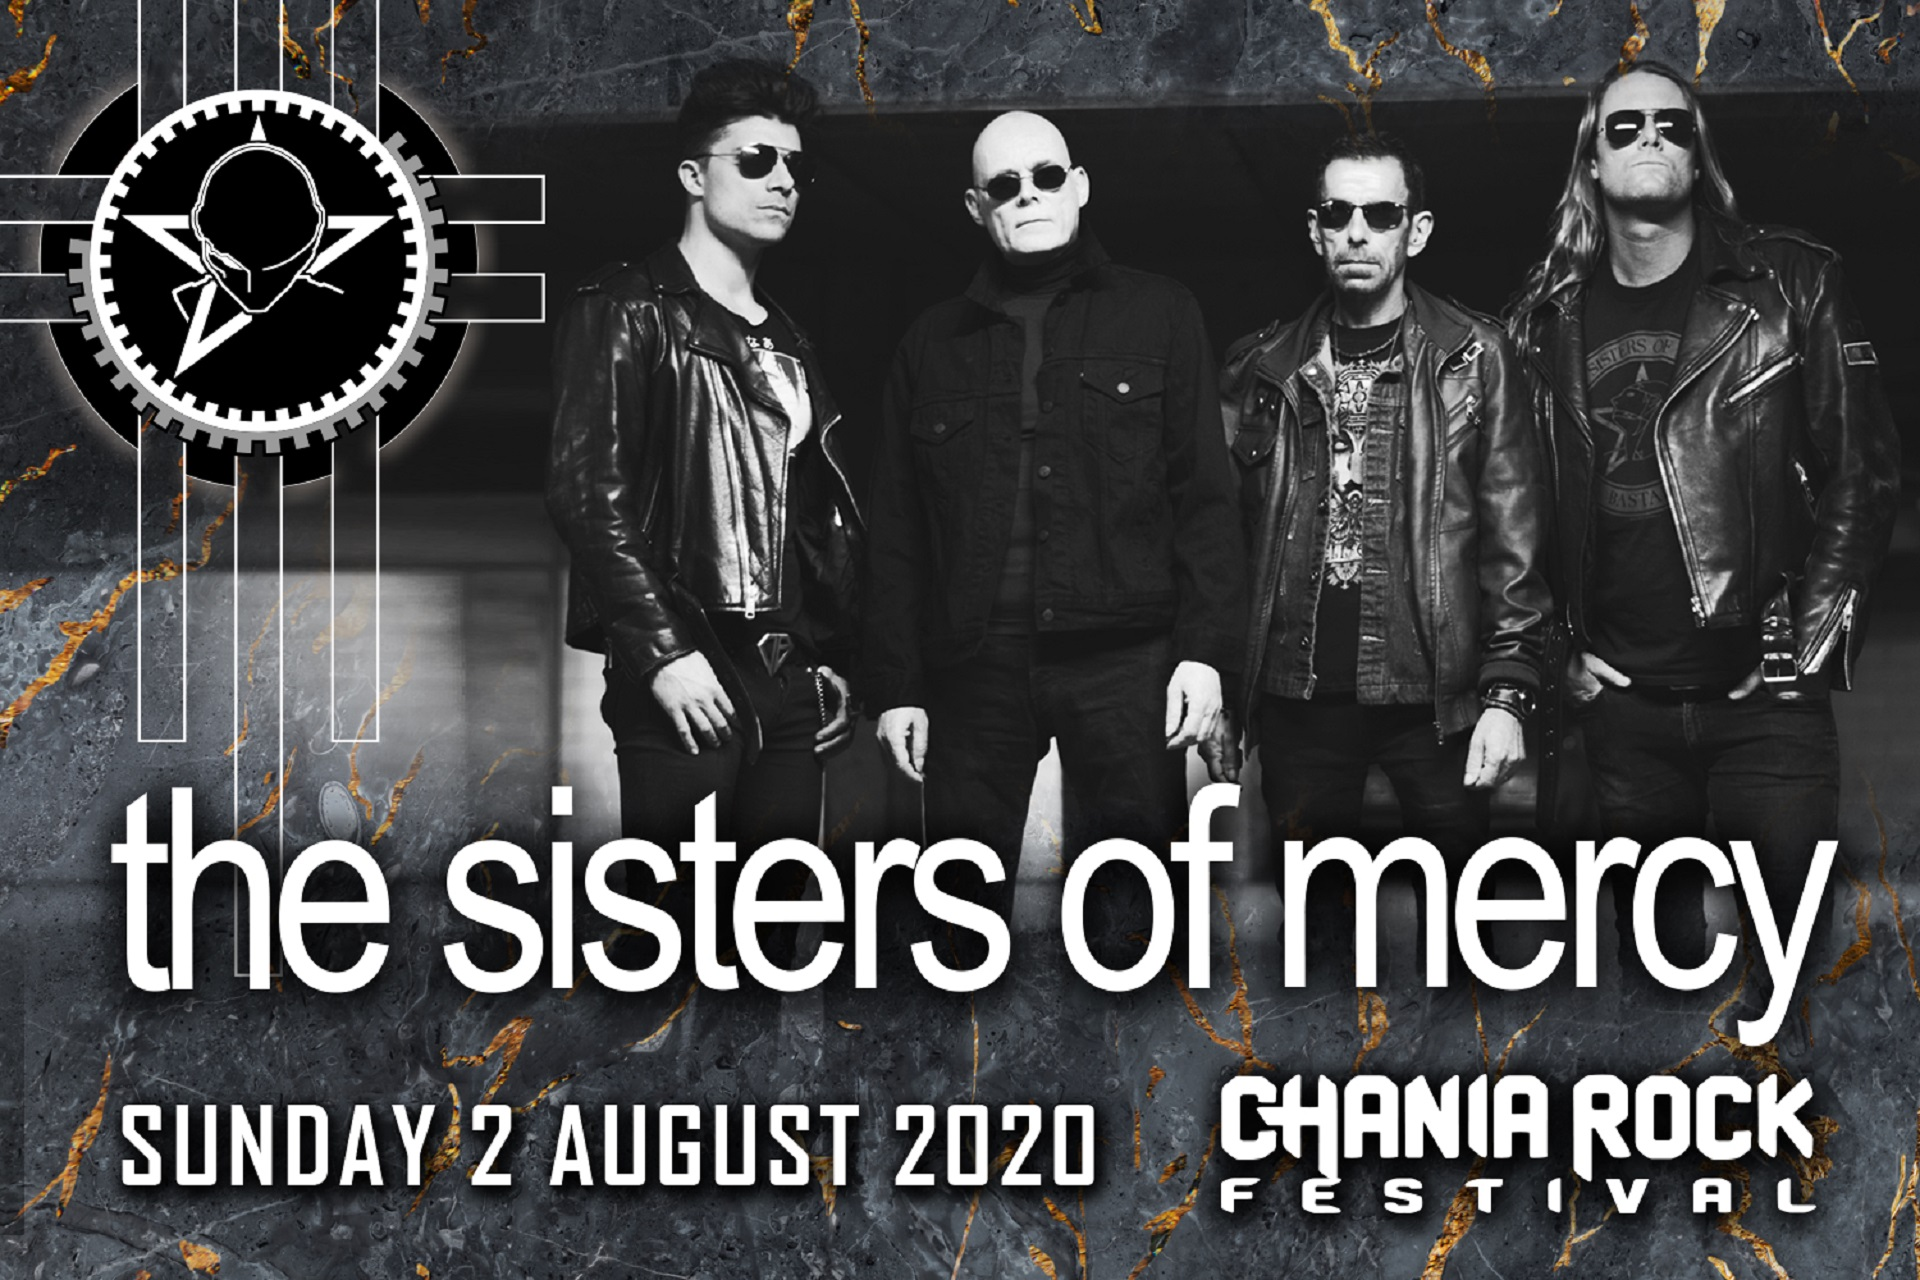 Chania Rock Festival